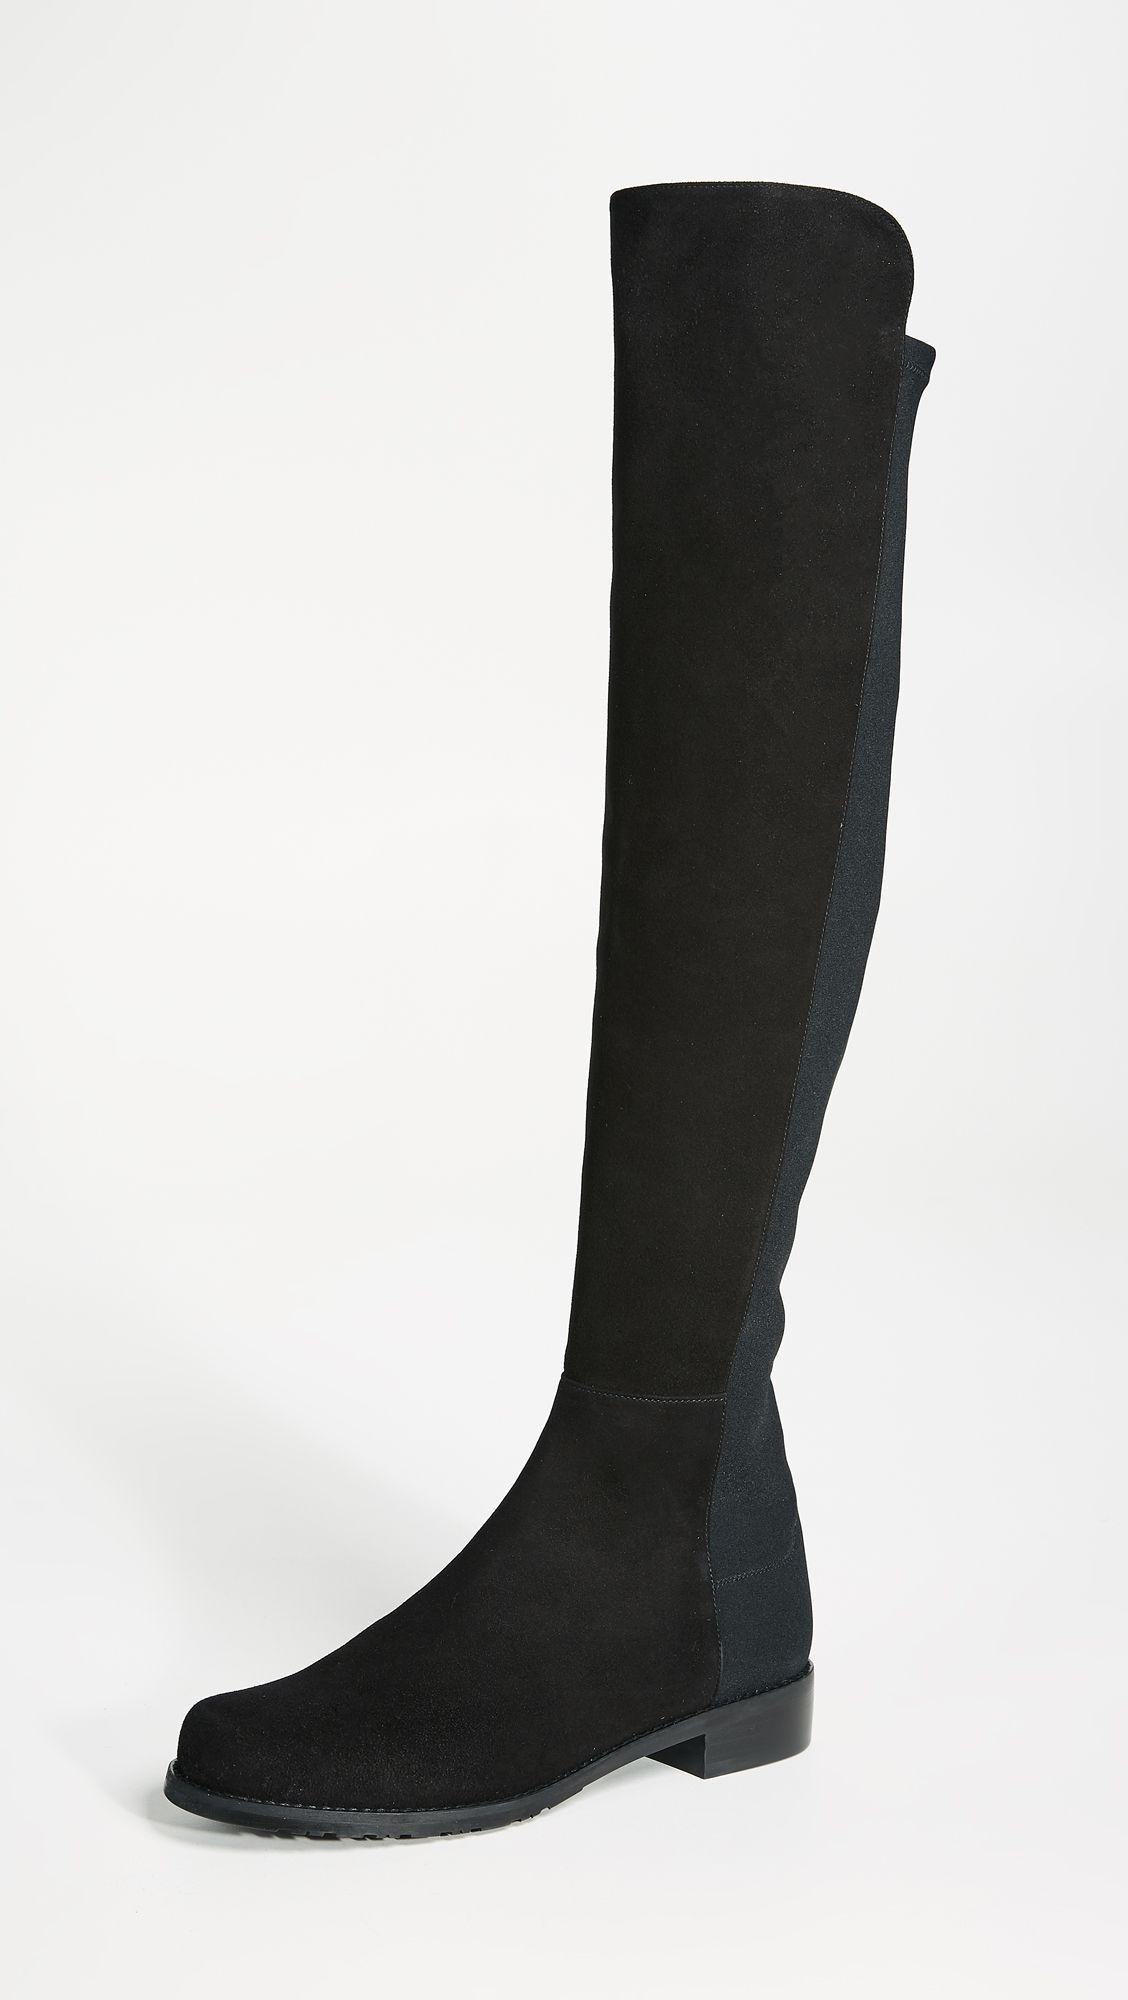 bedcb0df331a Stuart Weitzman 5050 Stretch Suede Boots